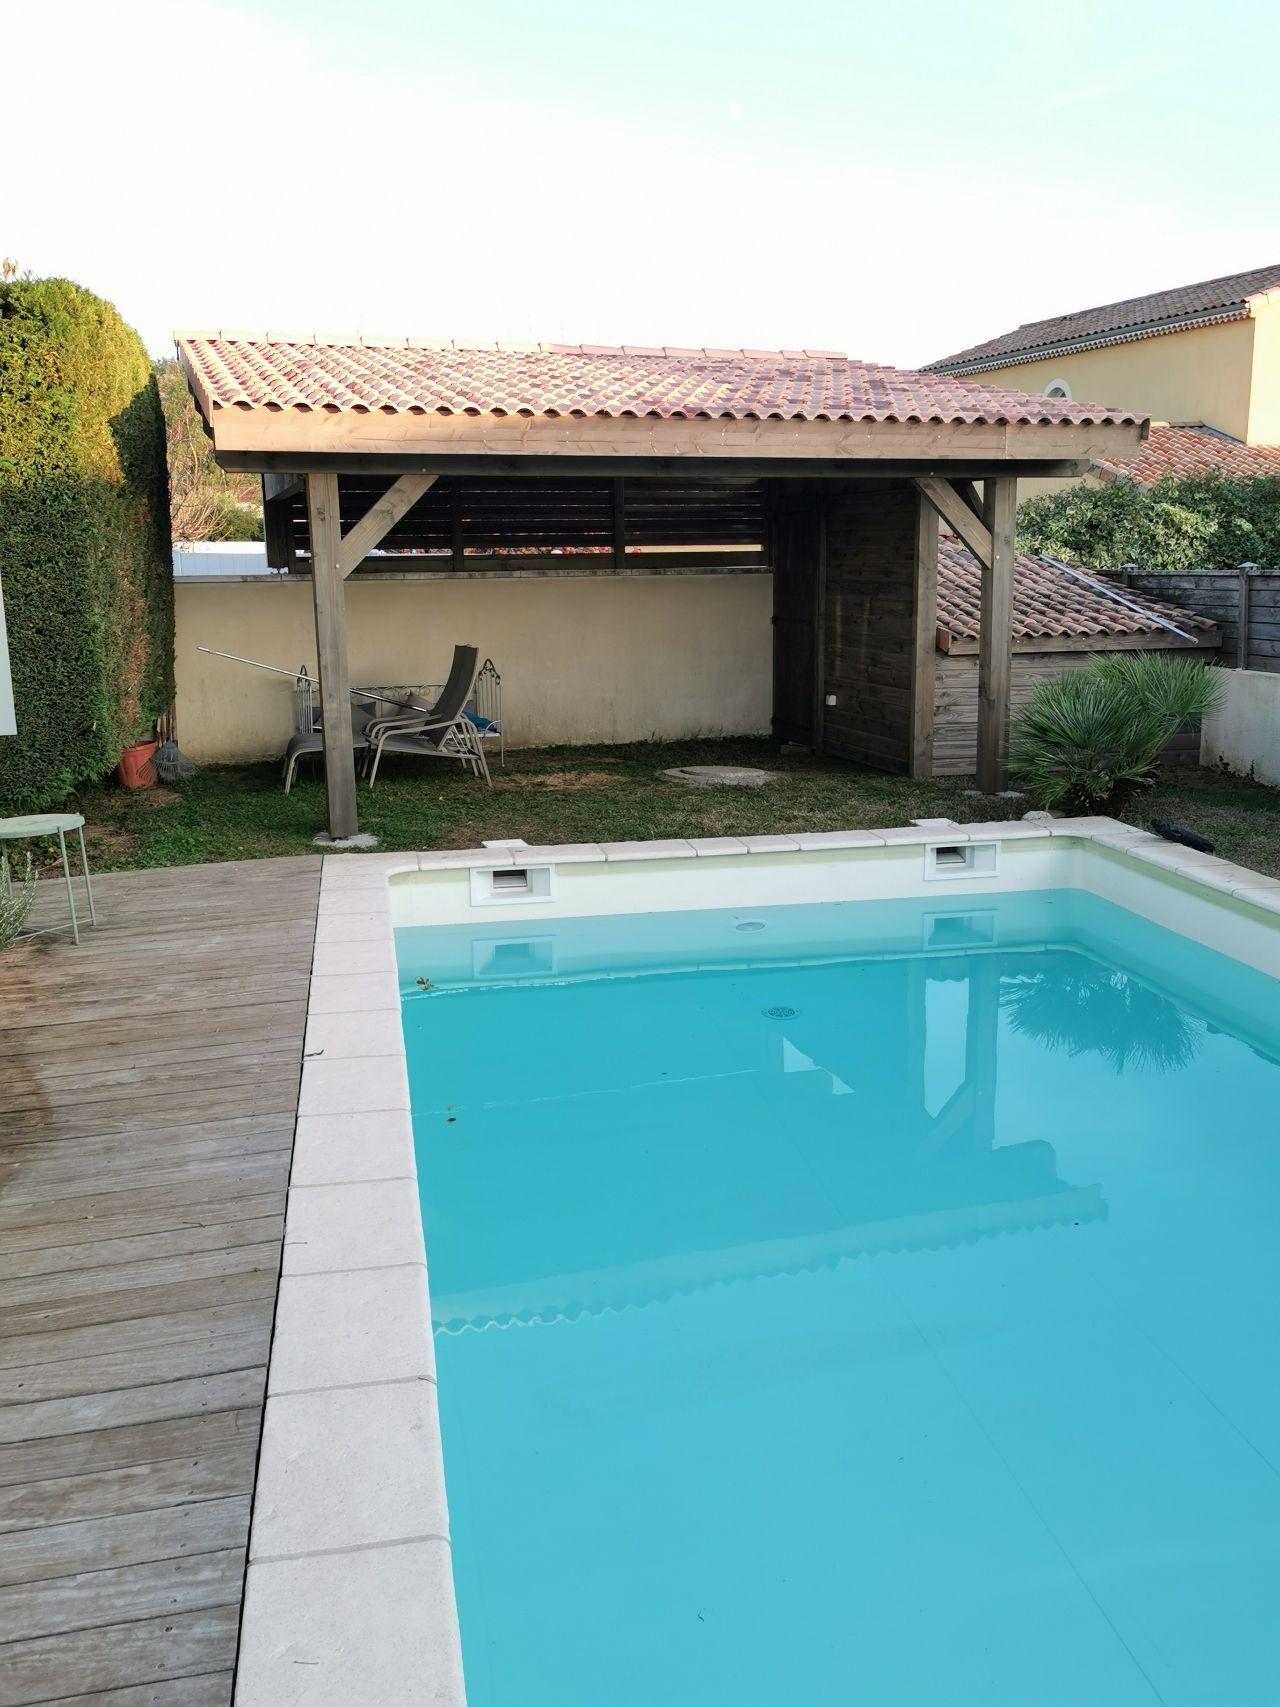 Pool-house-avec-volige_-bardage_-porte_-persiennes